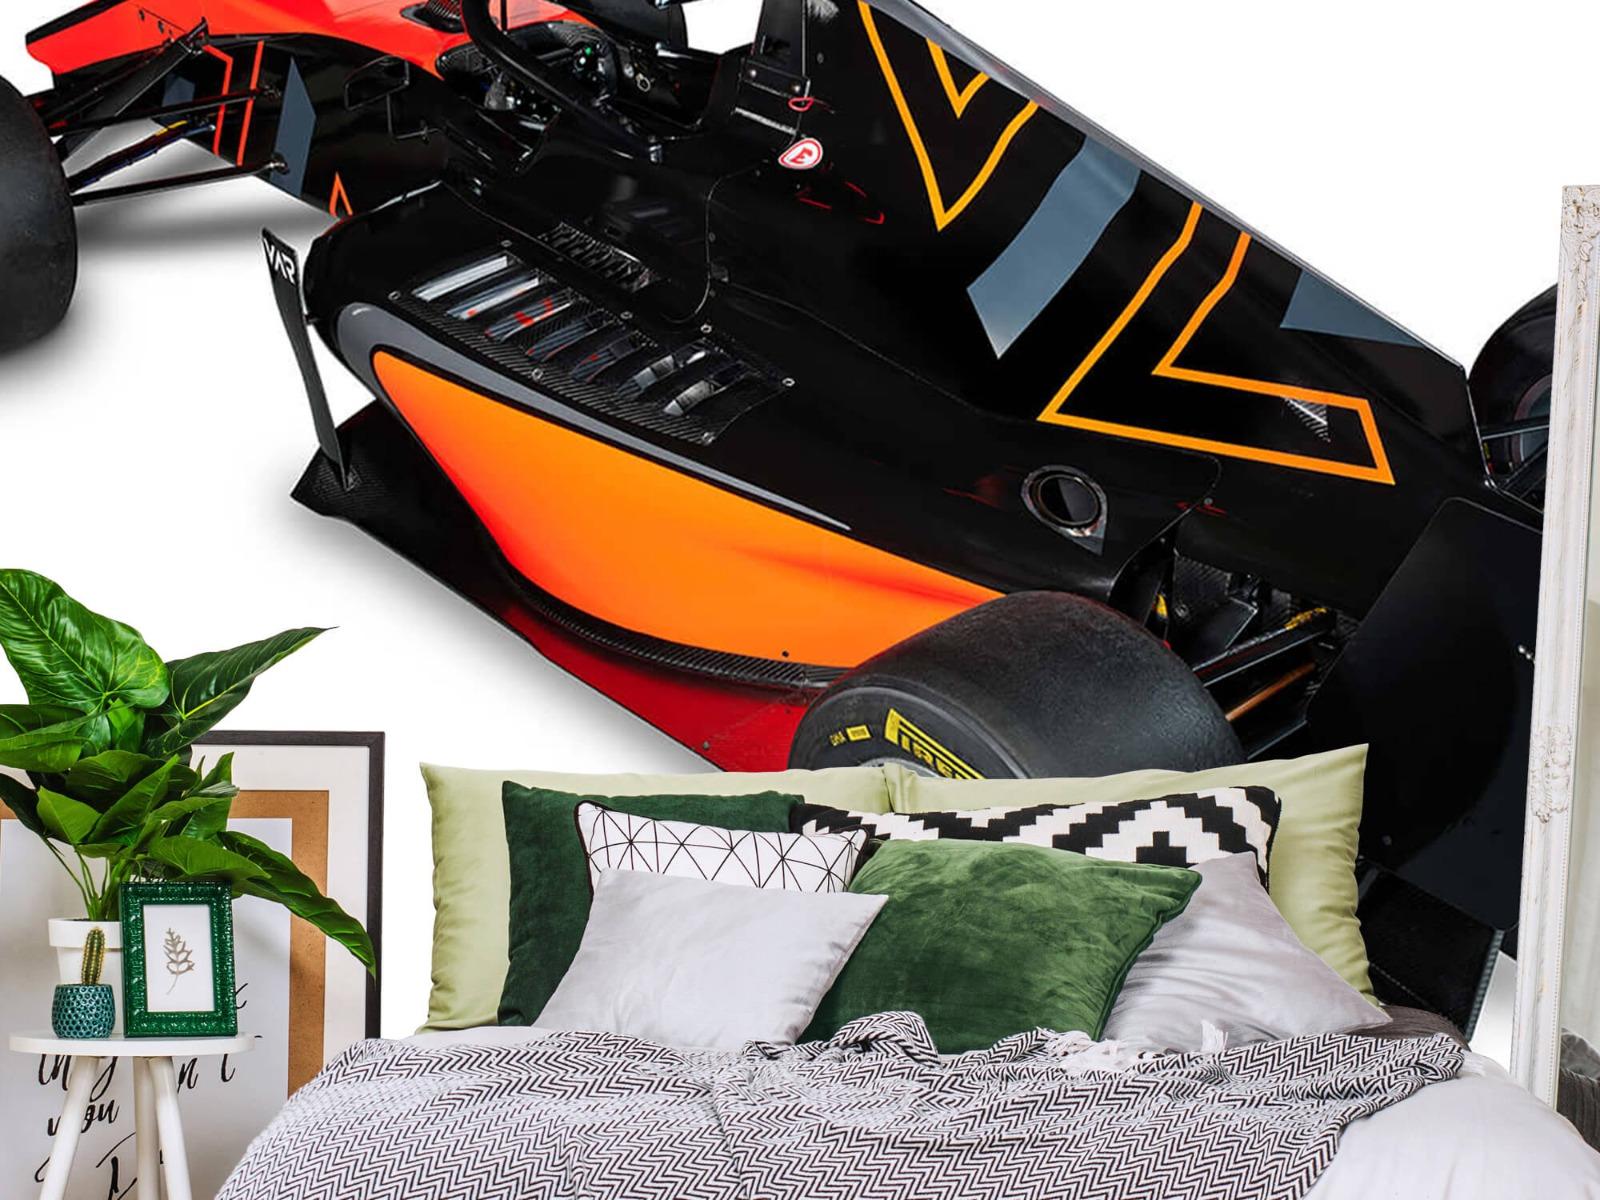 Sportauto's - Formula 3 - Rear left view - Hobbykamer 12